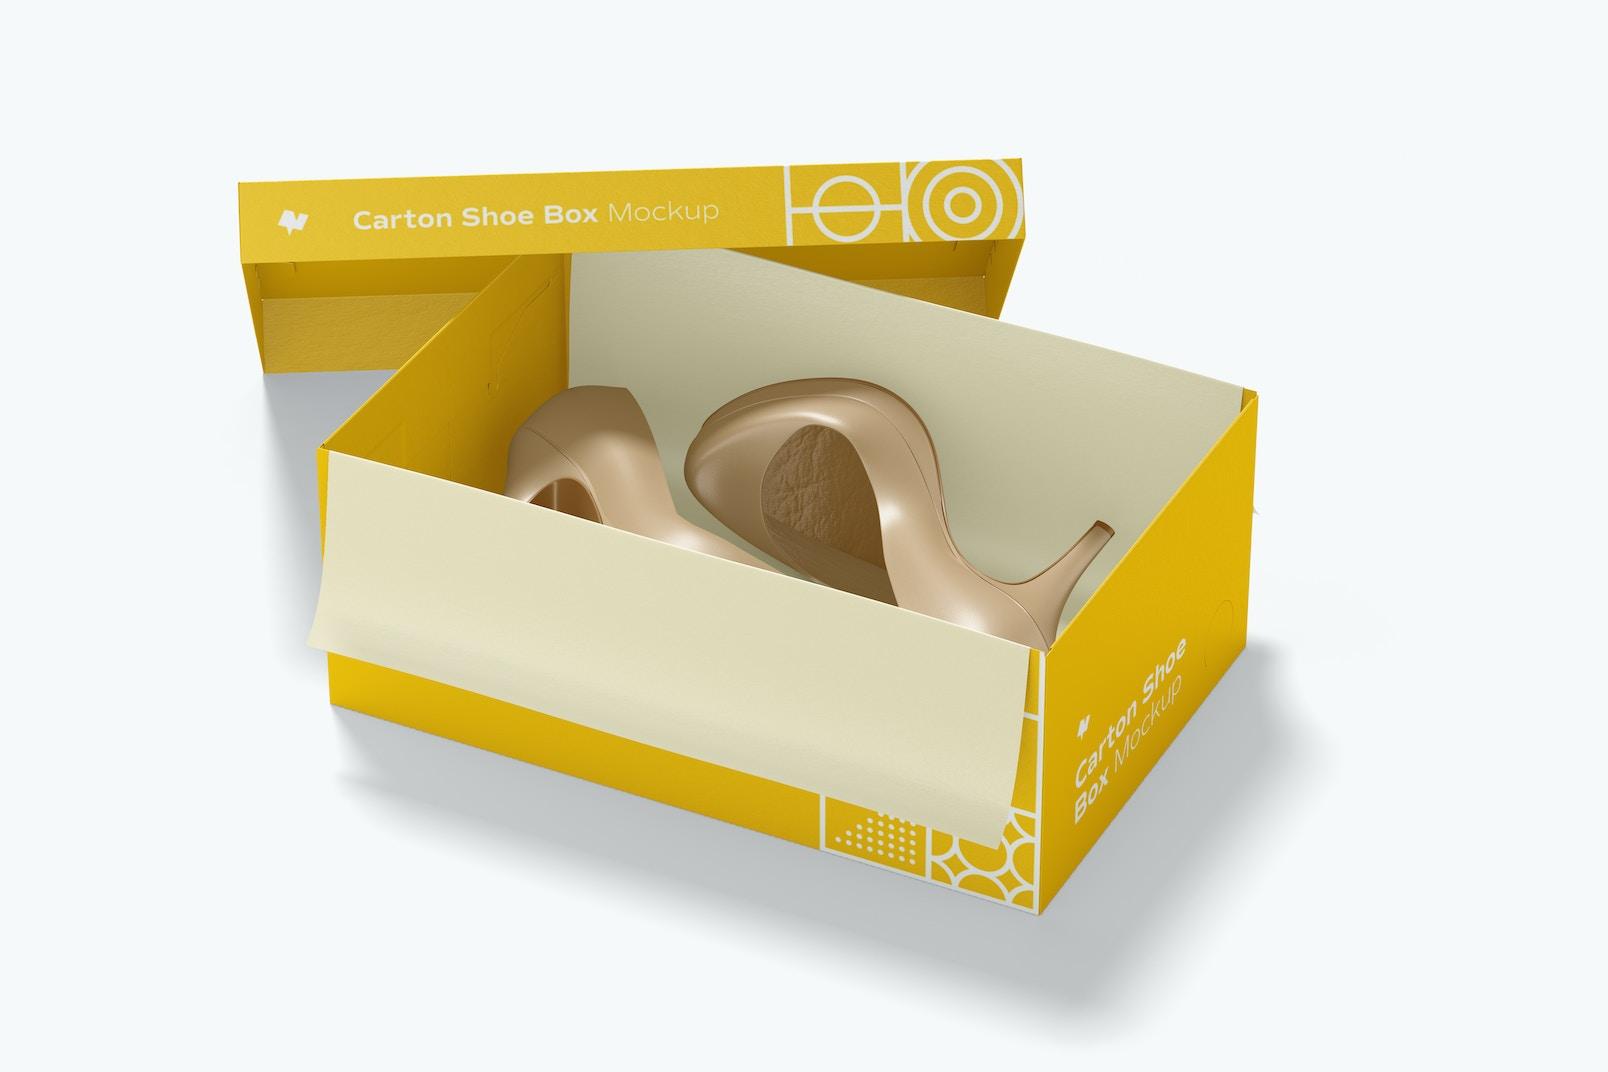 Carton Shoe Box Mockup, Perspective